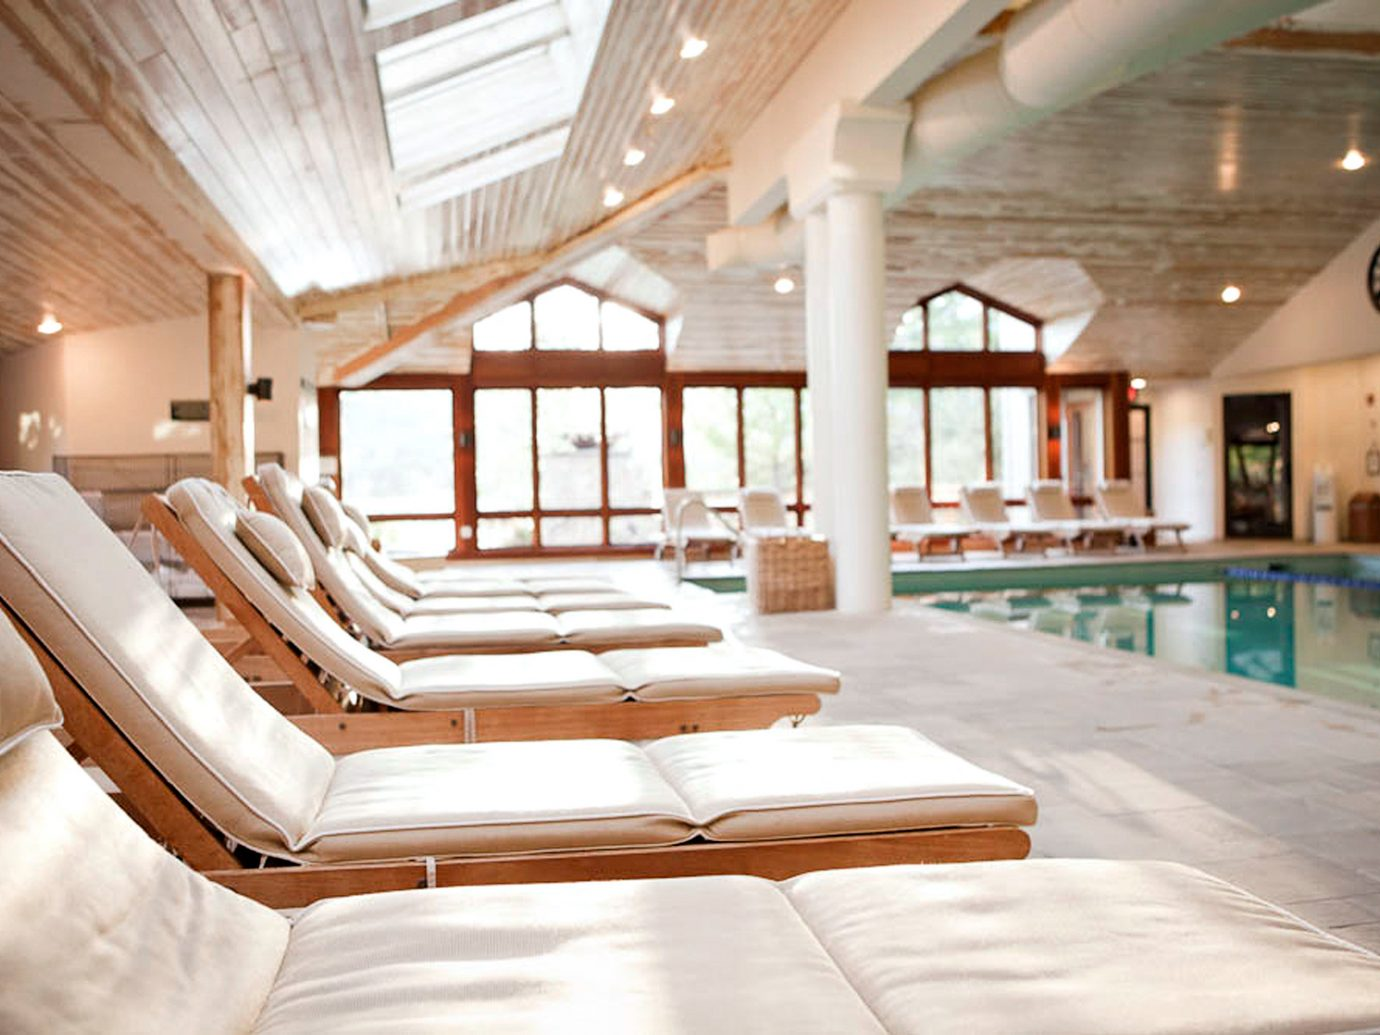 Country Lodge Pool Resort Spa Trip Ideas Wellness indoor ceiling room property estate floor interior design living room swimming pool home real estate Design furniture